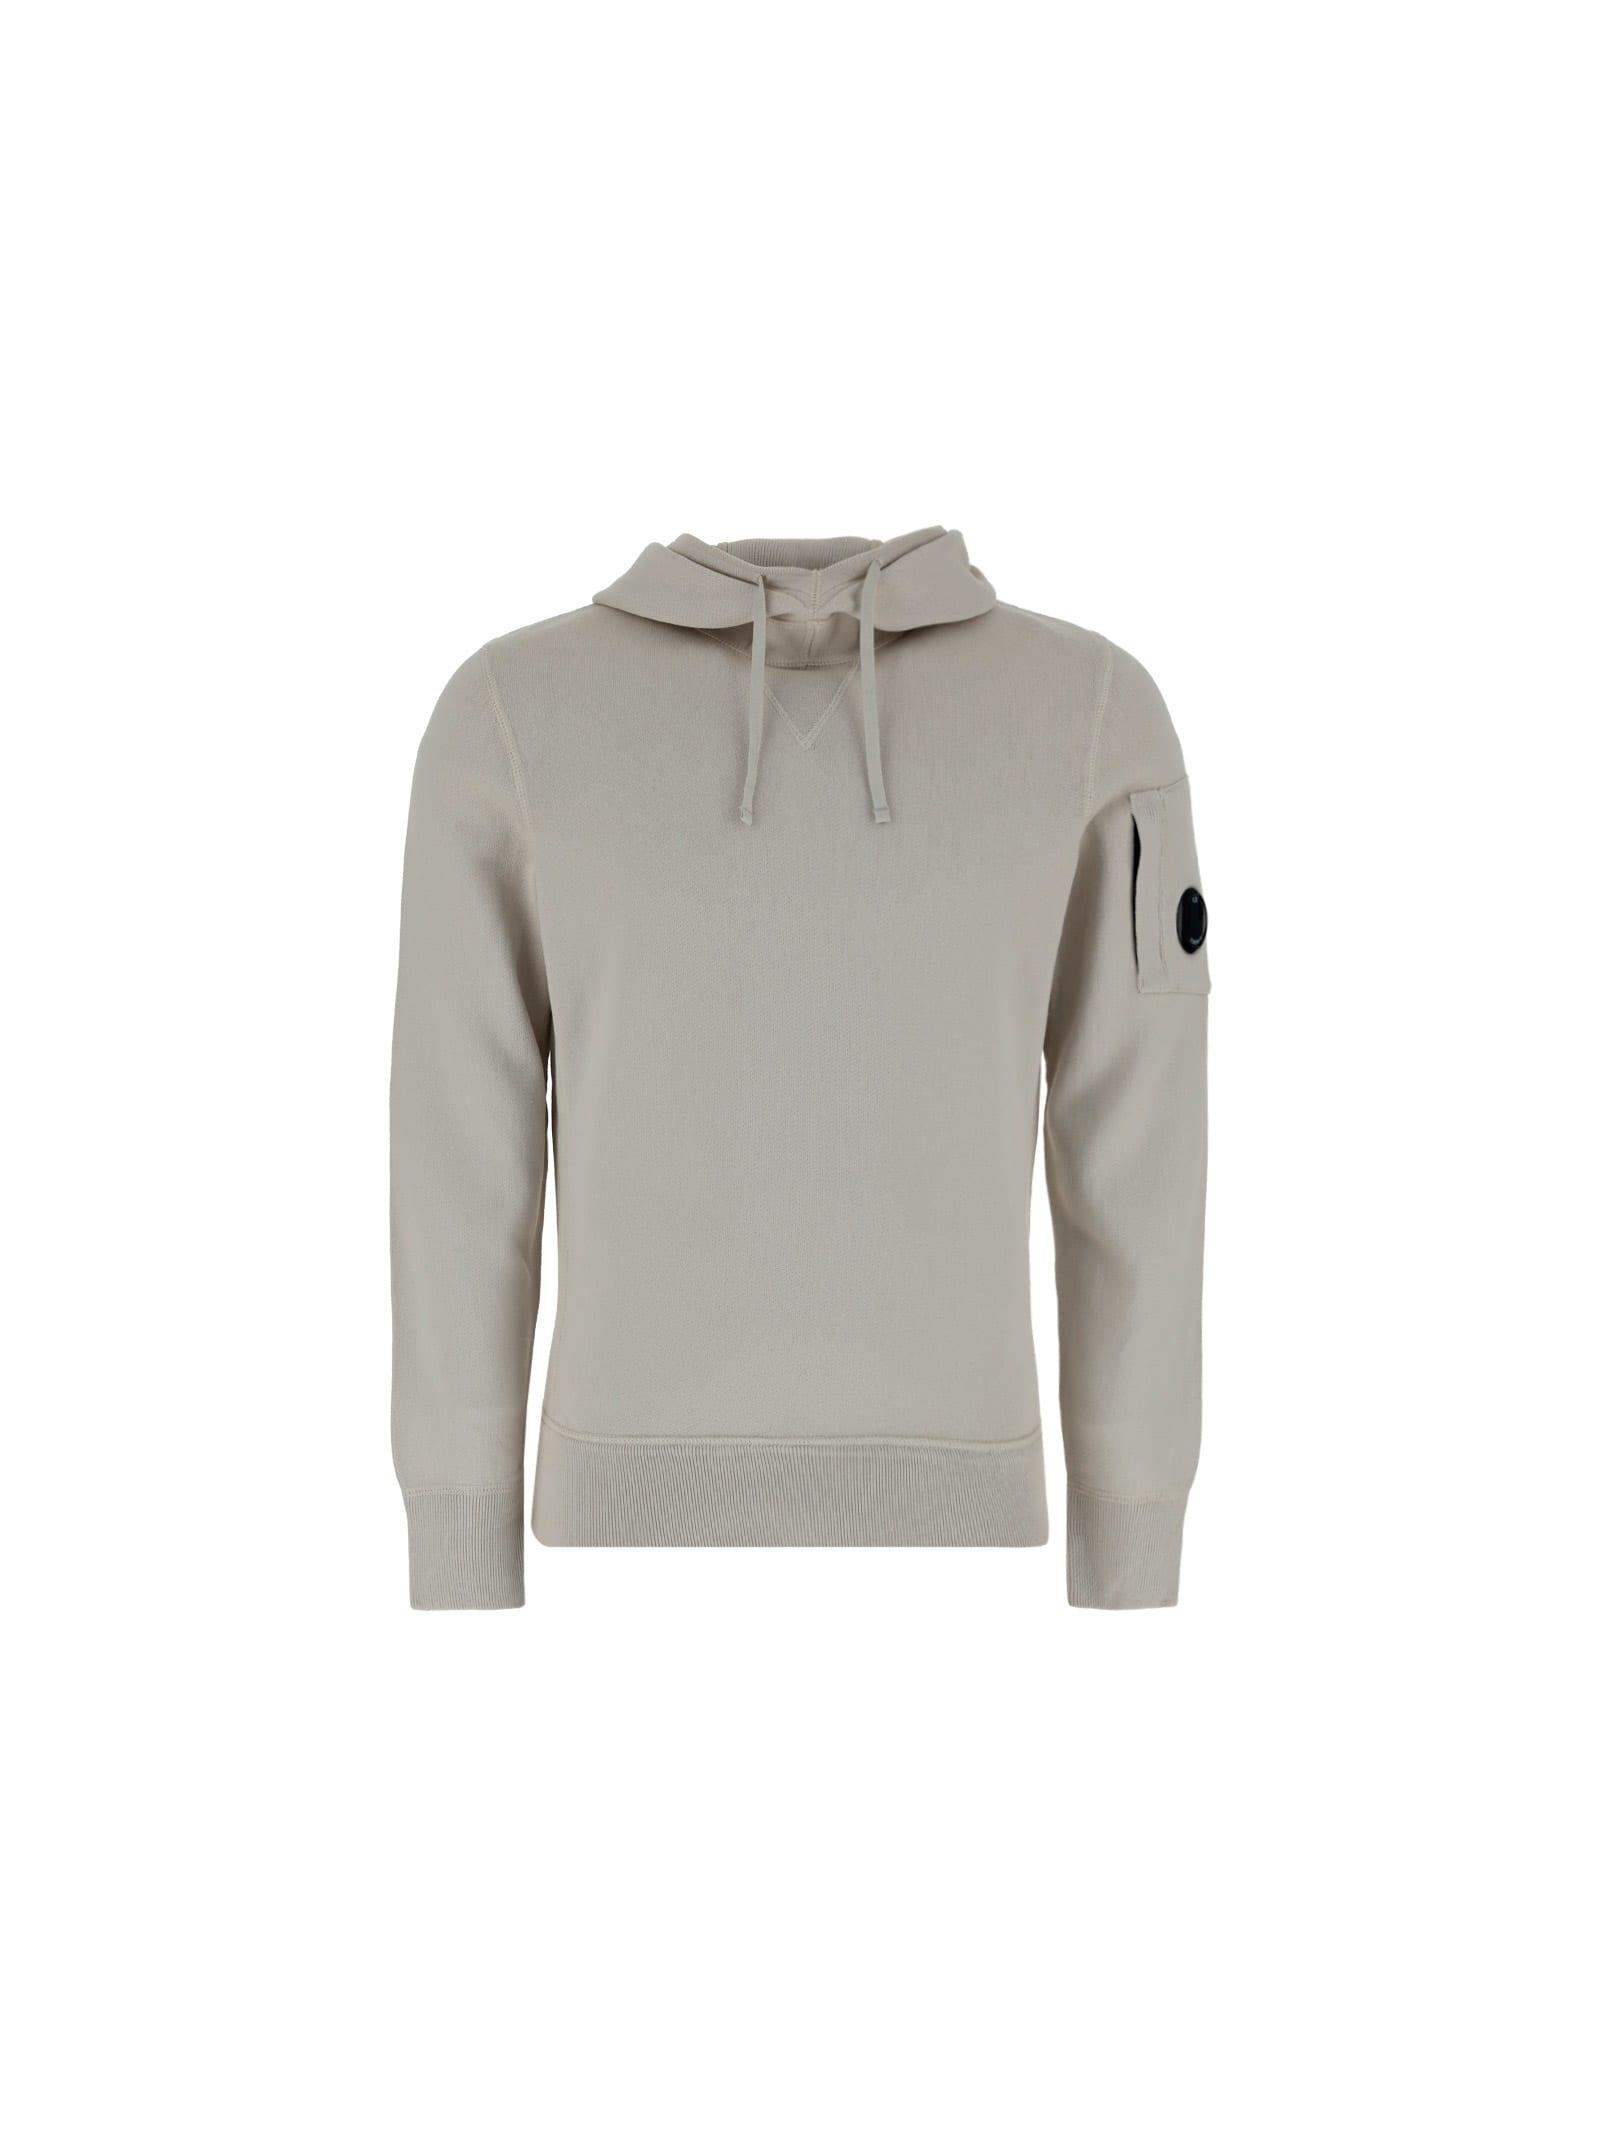 C.p. Company Cp Company Sweatshirt In Sandshell